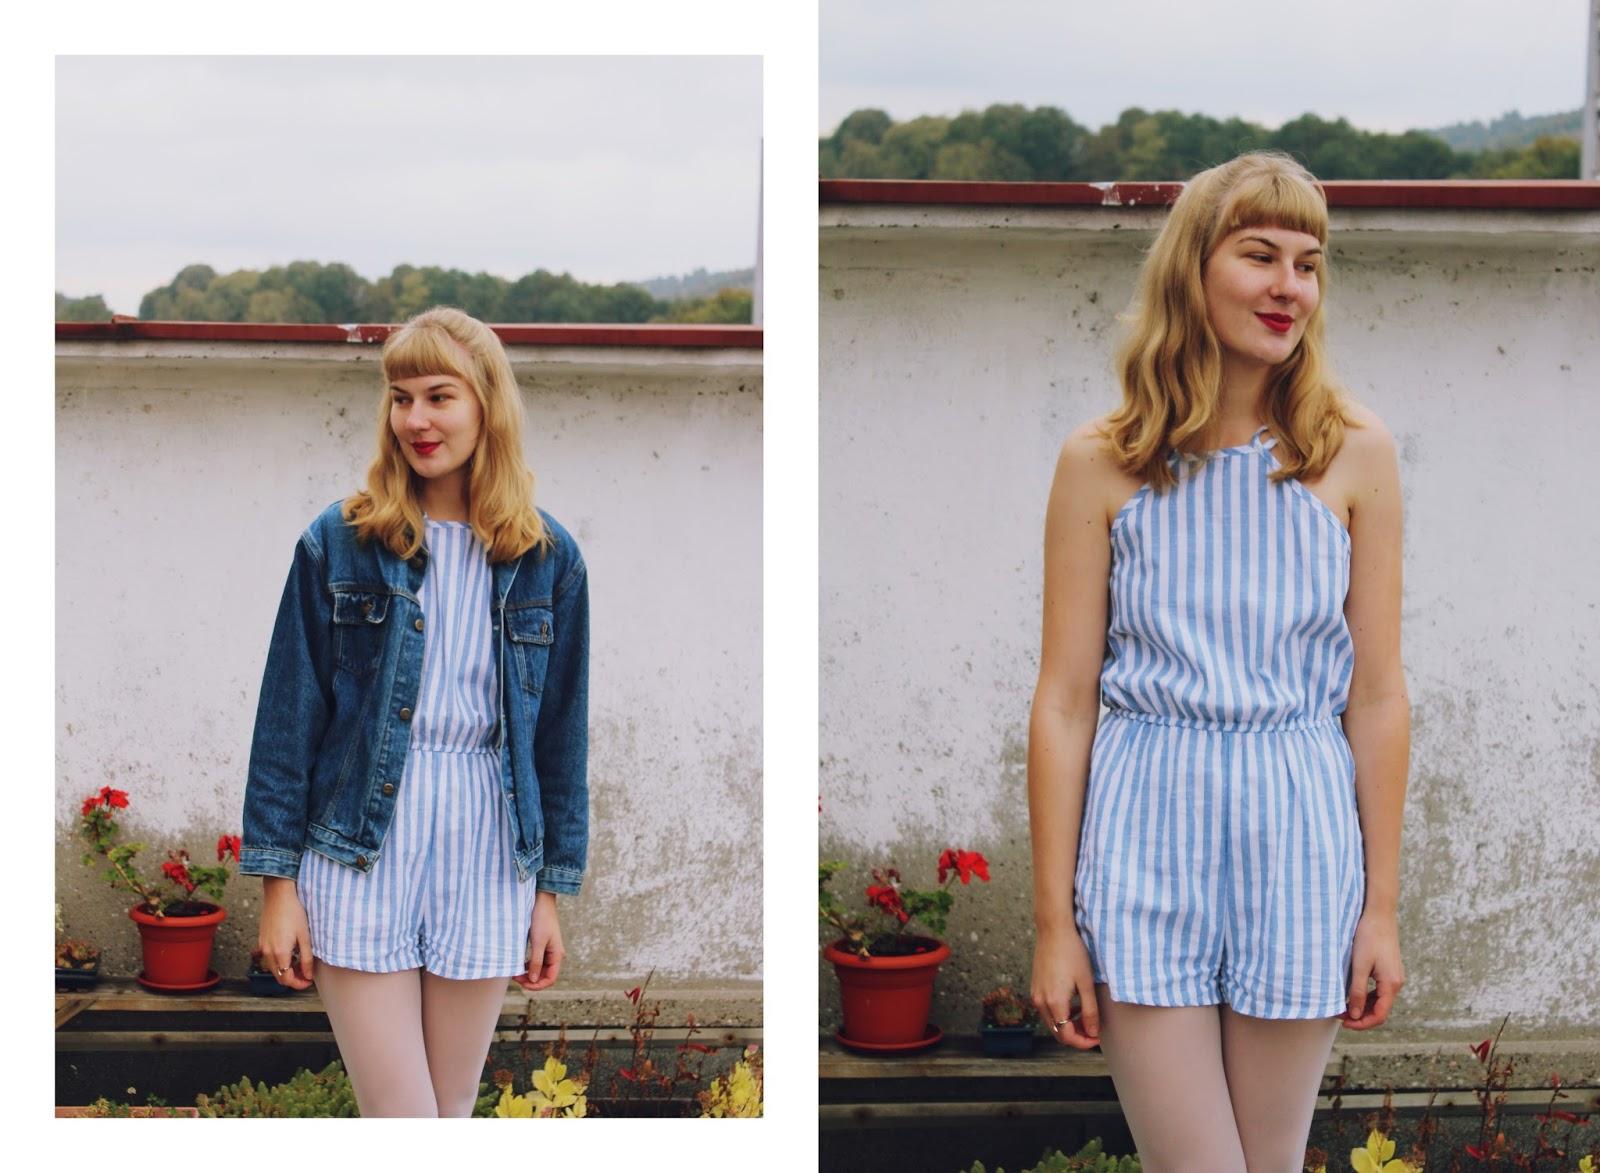 filipa canic blog, youarethepoet, you are the poet blog, filipa canic, dresslily, romper, fashion blog